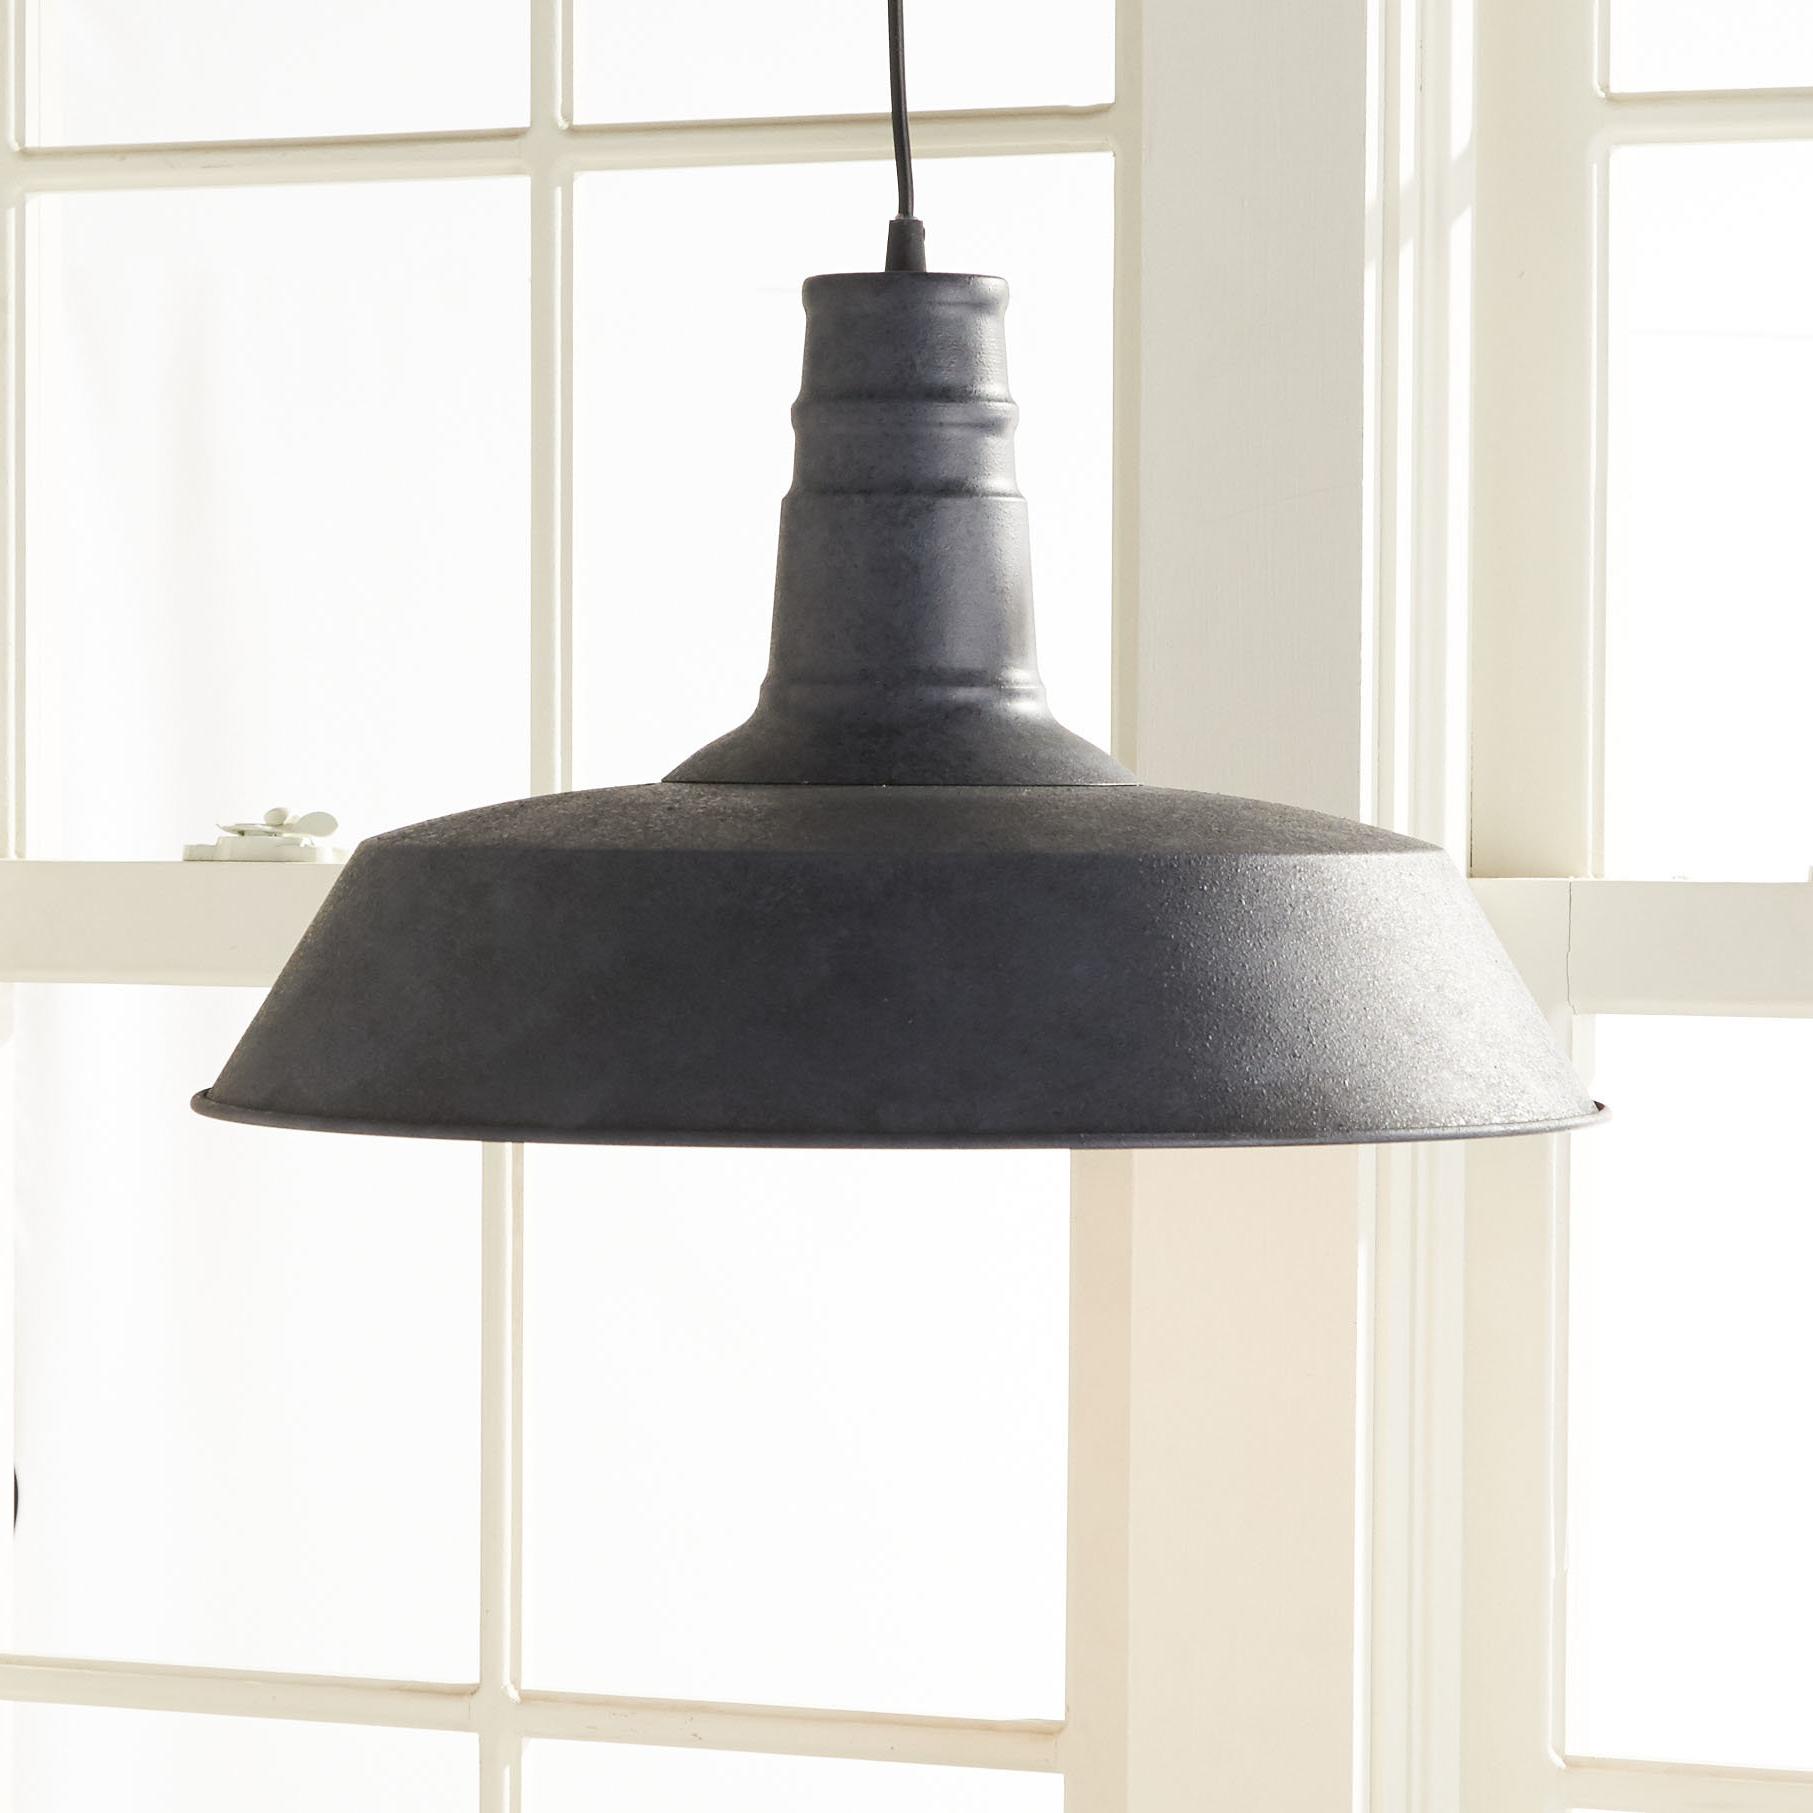 Ilgaz 1 Light Single Dome Pendant With Newest Abordale 1 Light Single Dome Pendants (View 13 of 25)